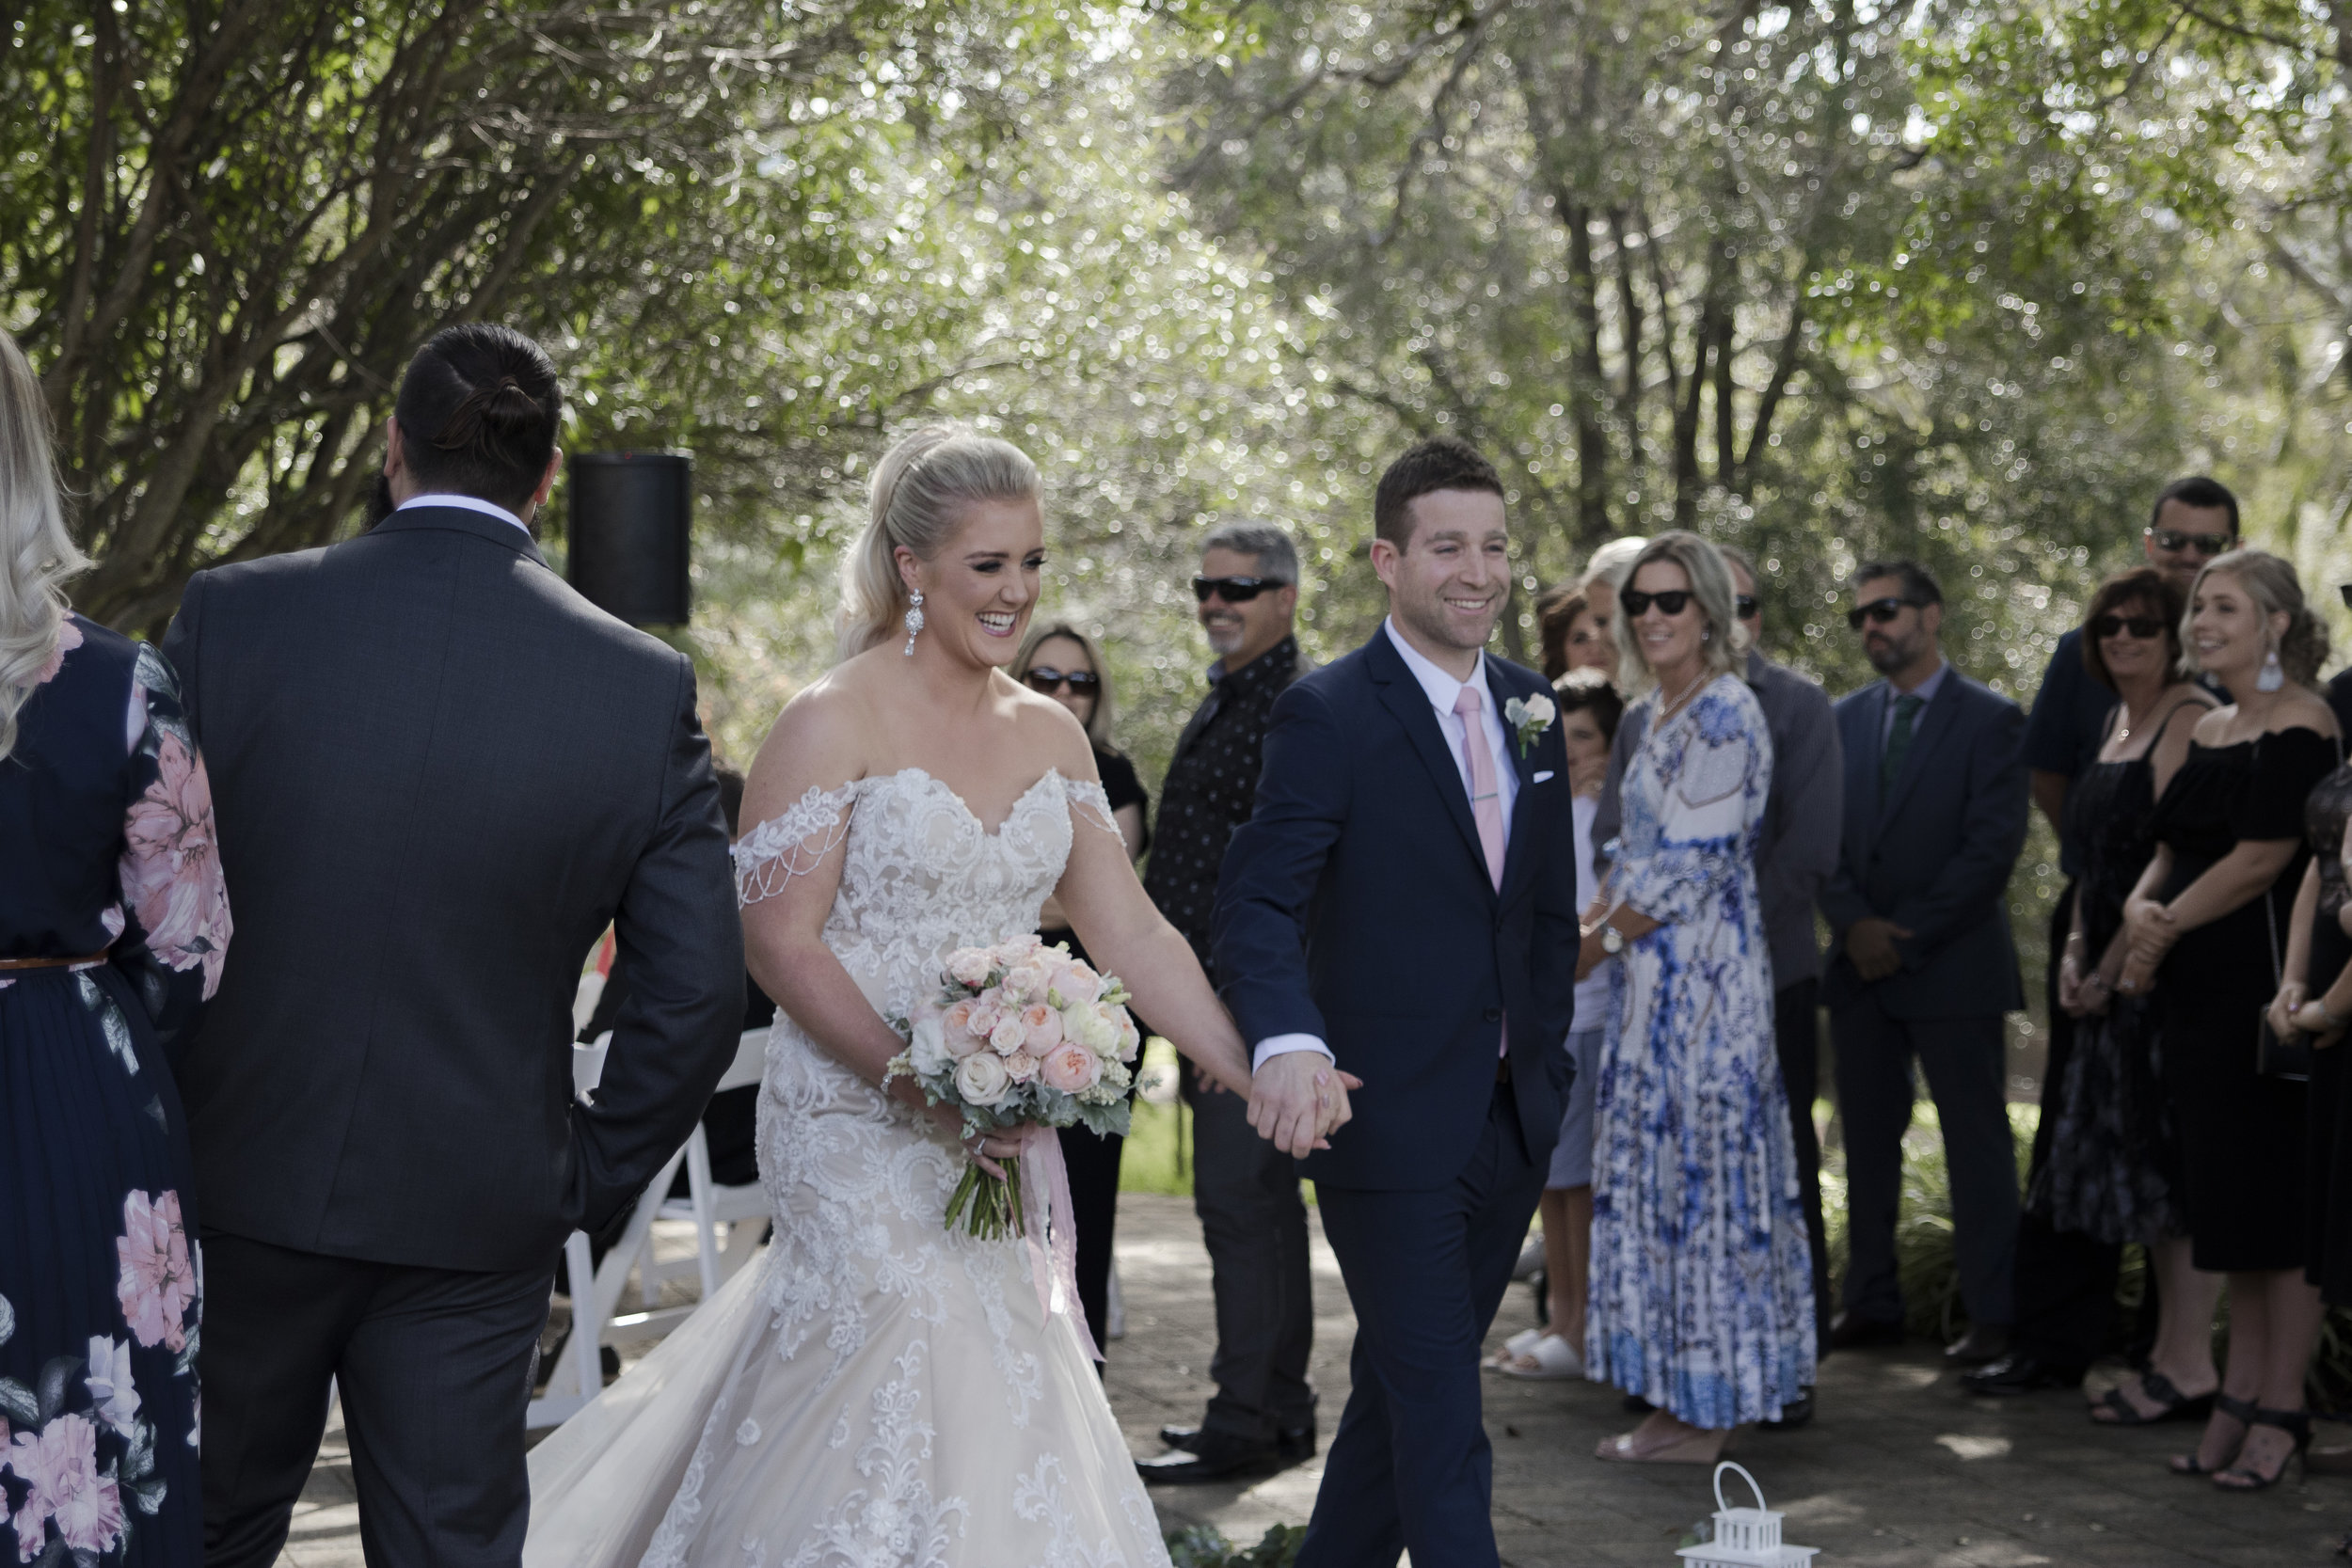 Teagan_Mayflower Weddings Photography_123.jpg